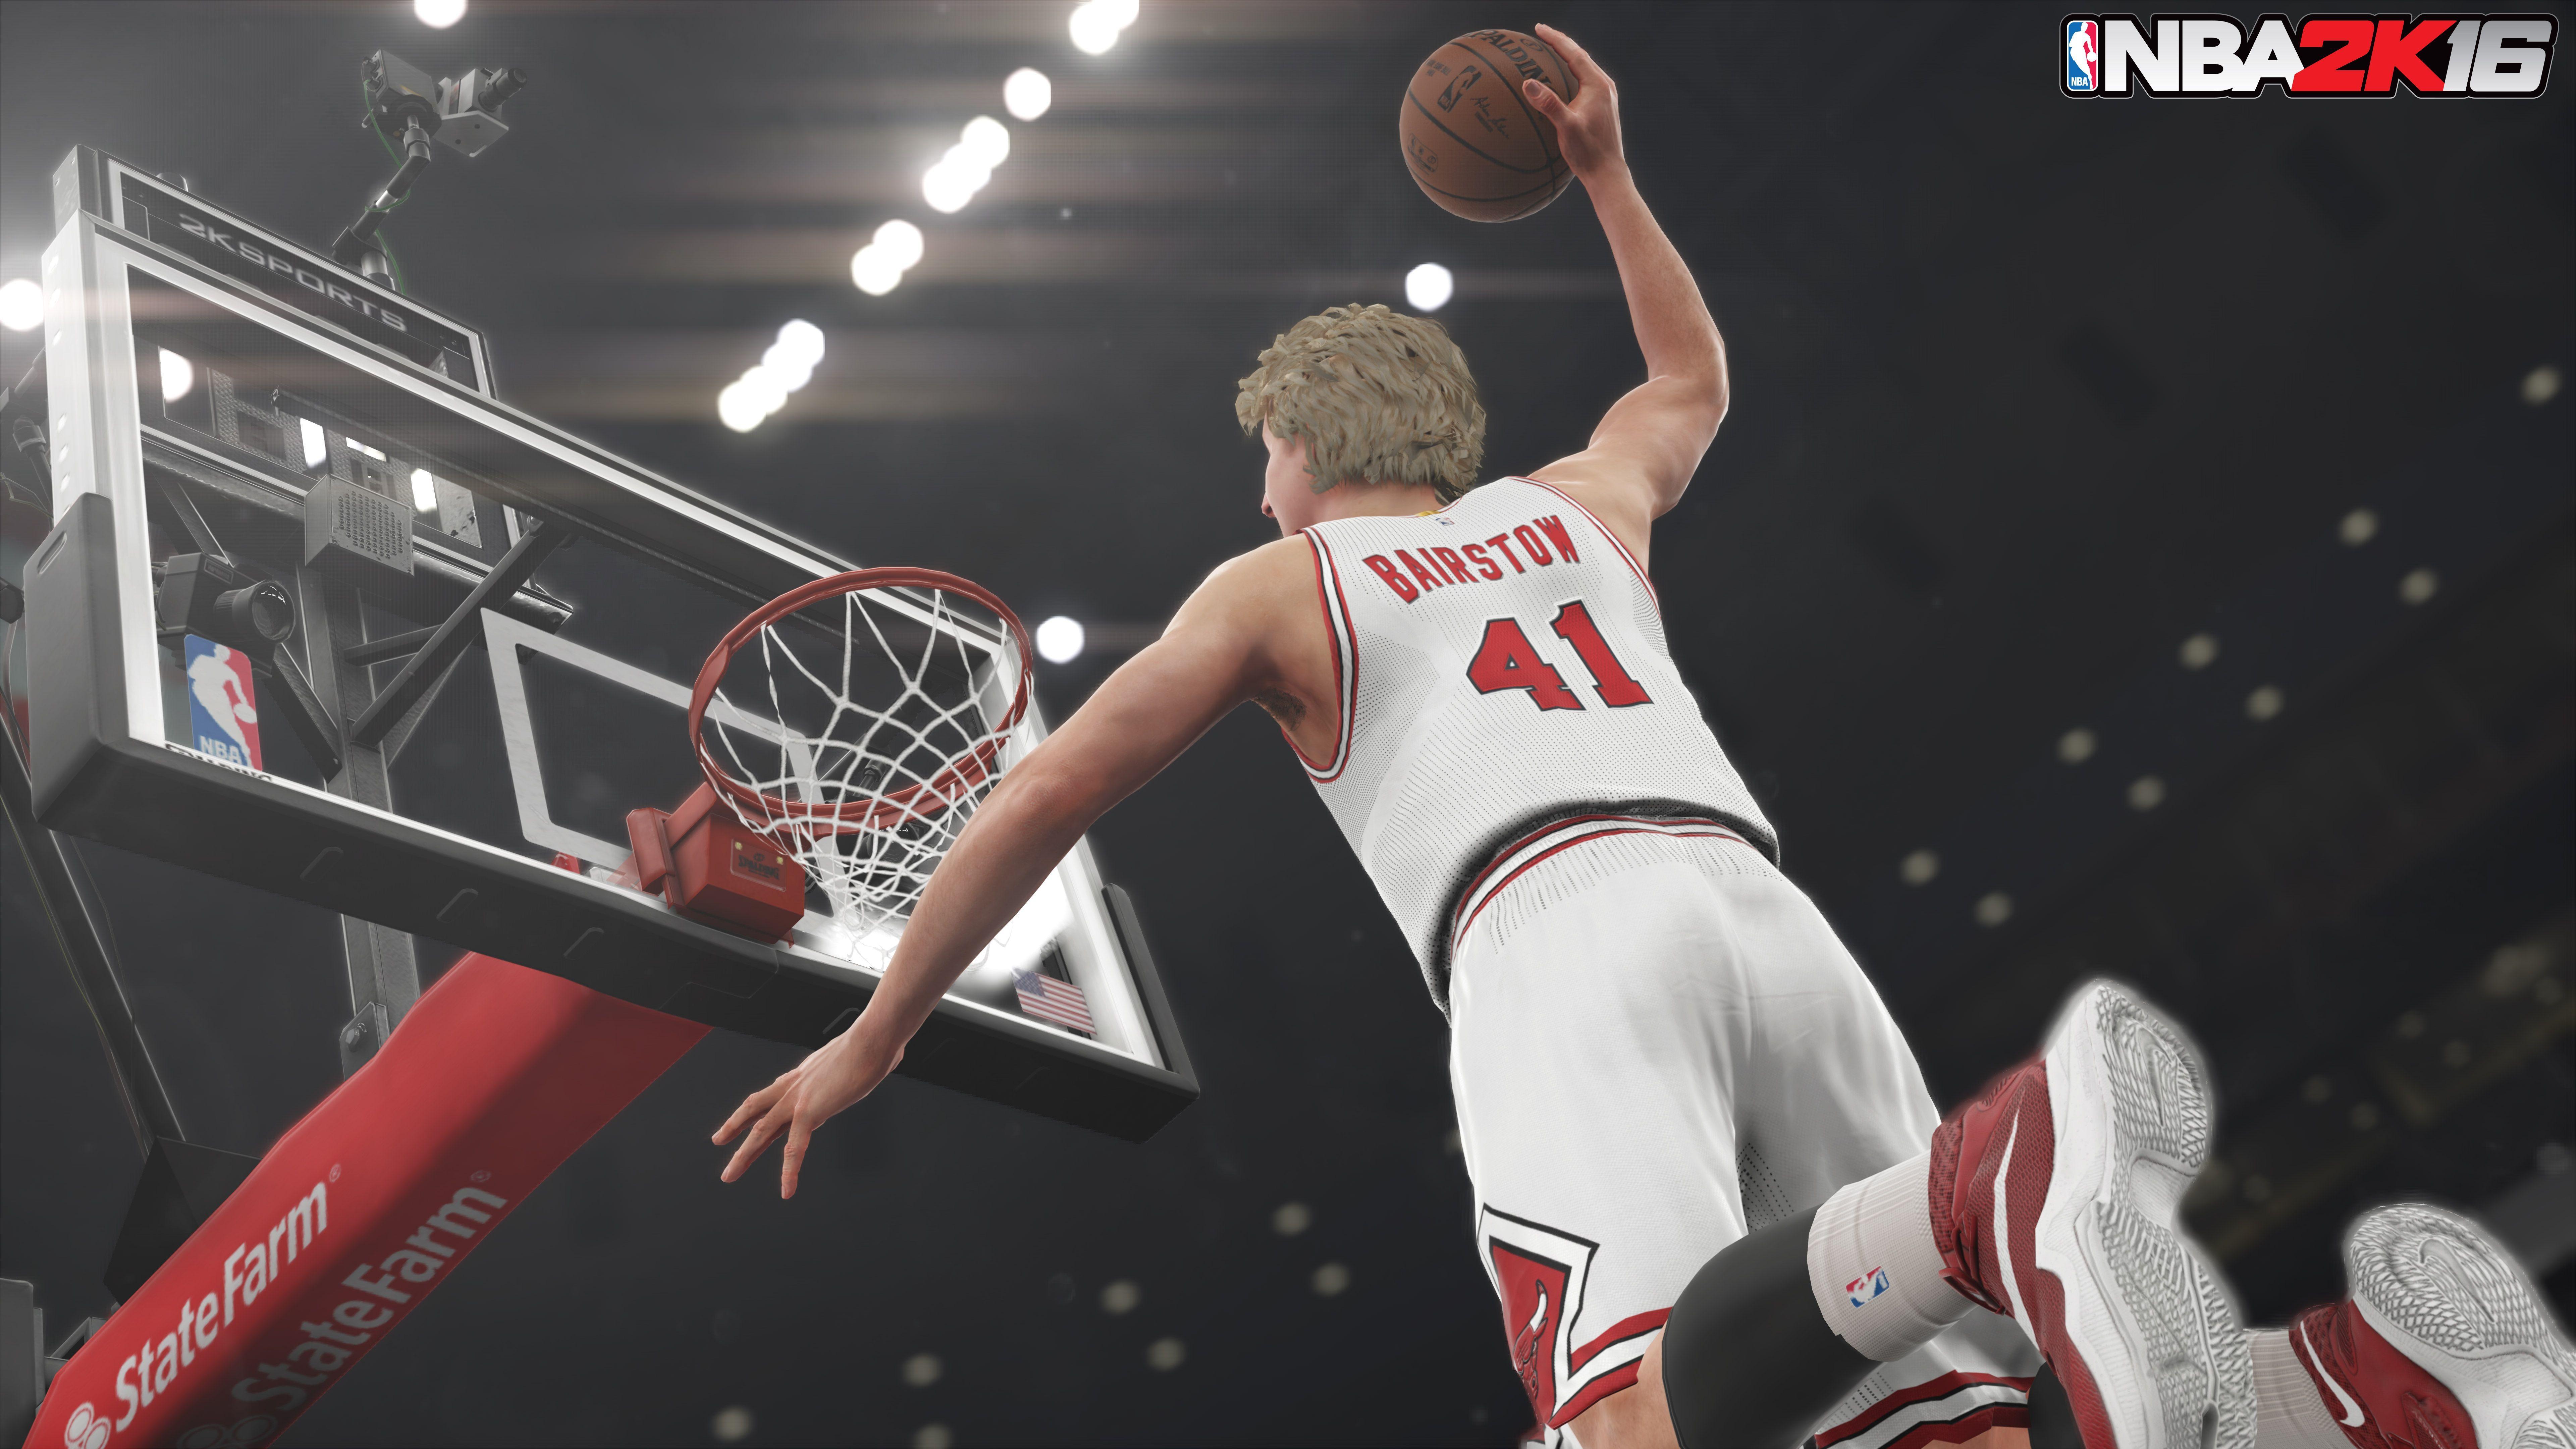 2k Dope Backgrounds: NBA 2k17 Wallpapers